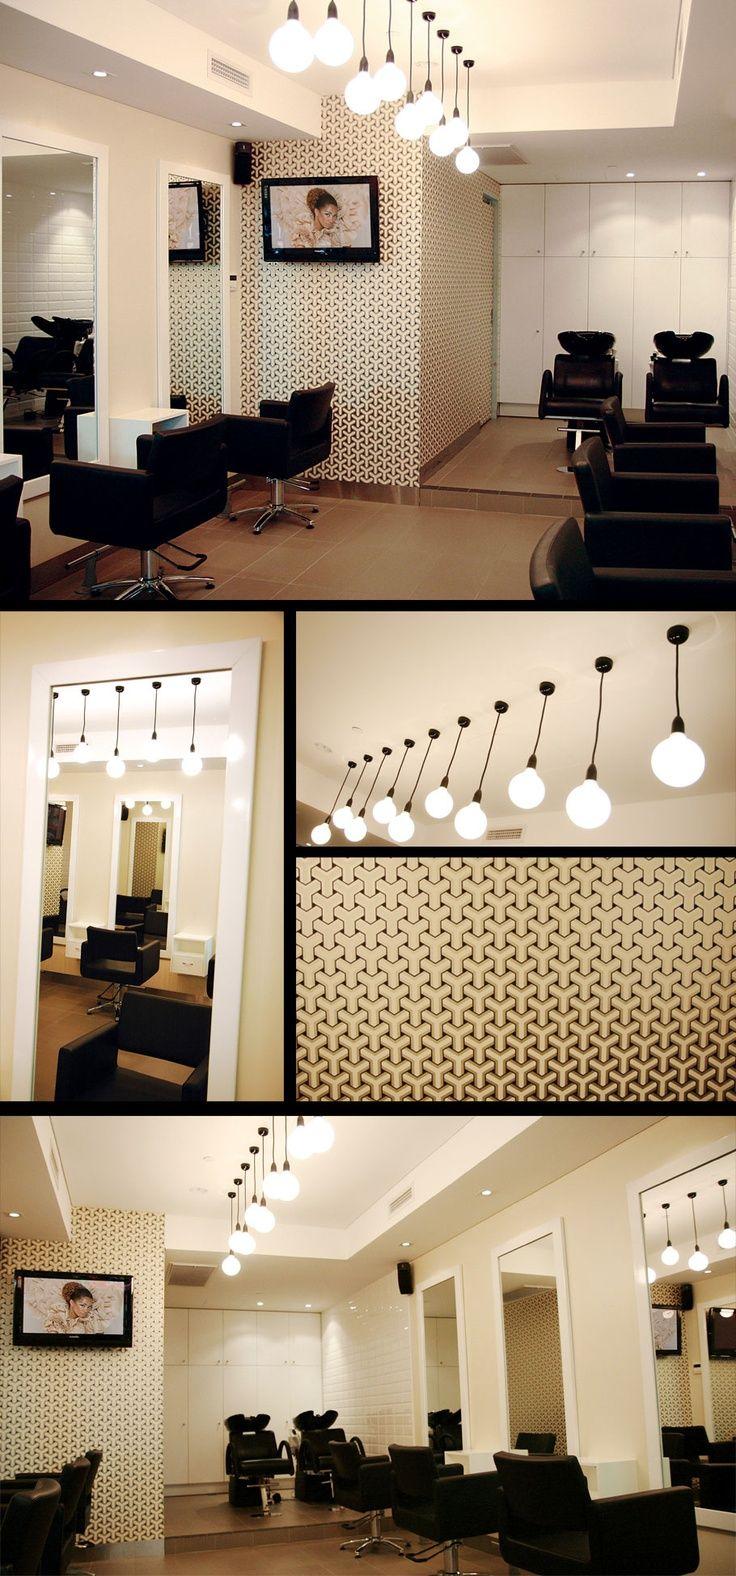 Lighting & pattern